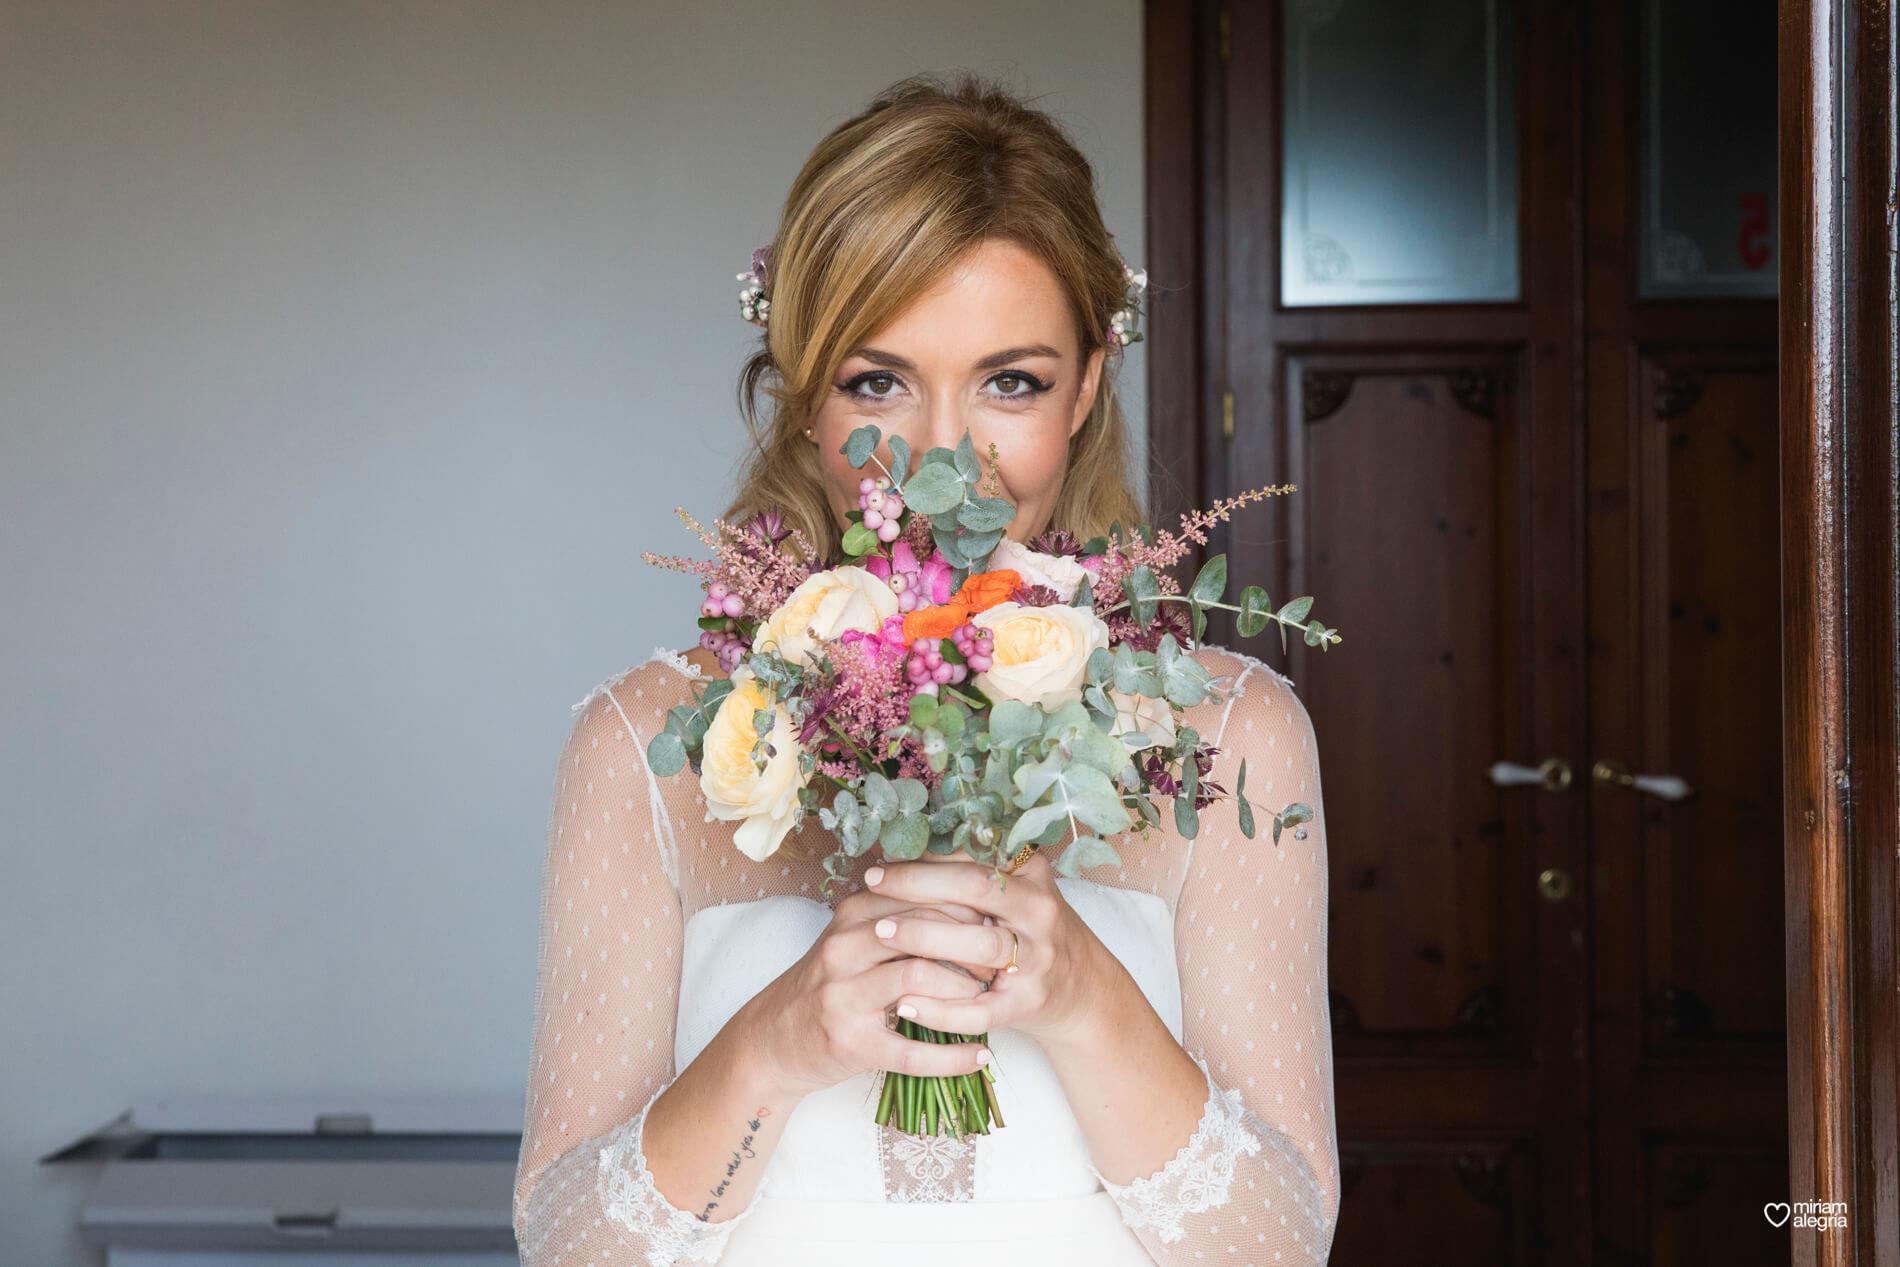 la-boda-de-alemc7-miriam-alegria-fotografos-boda-murcia-32